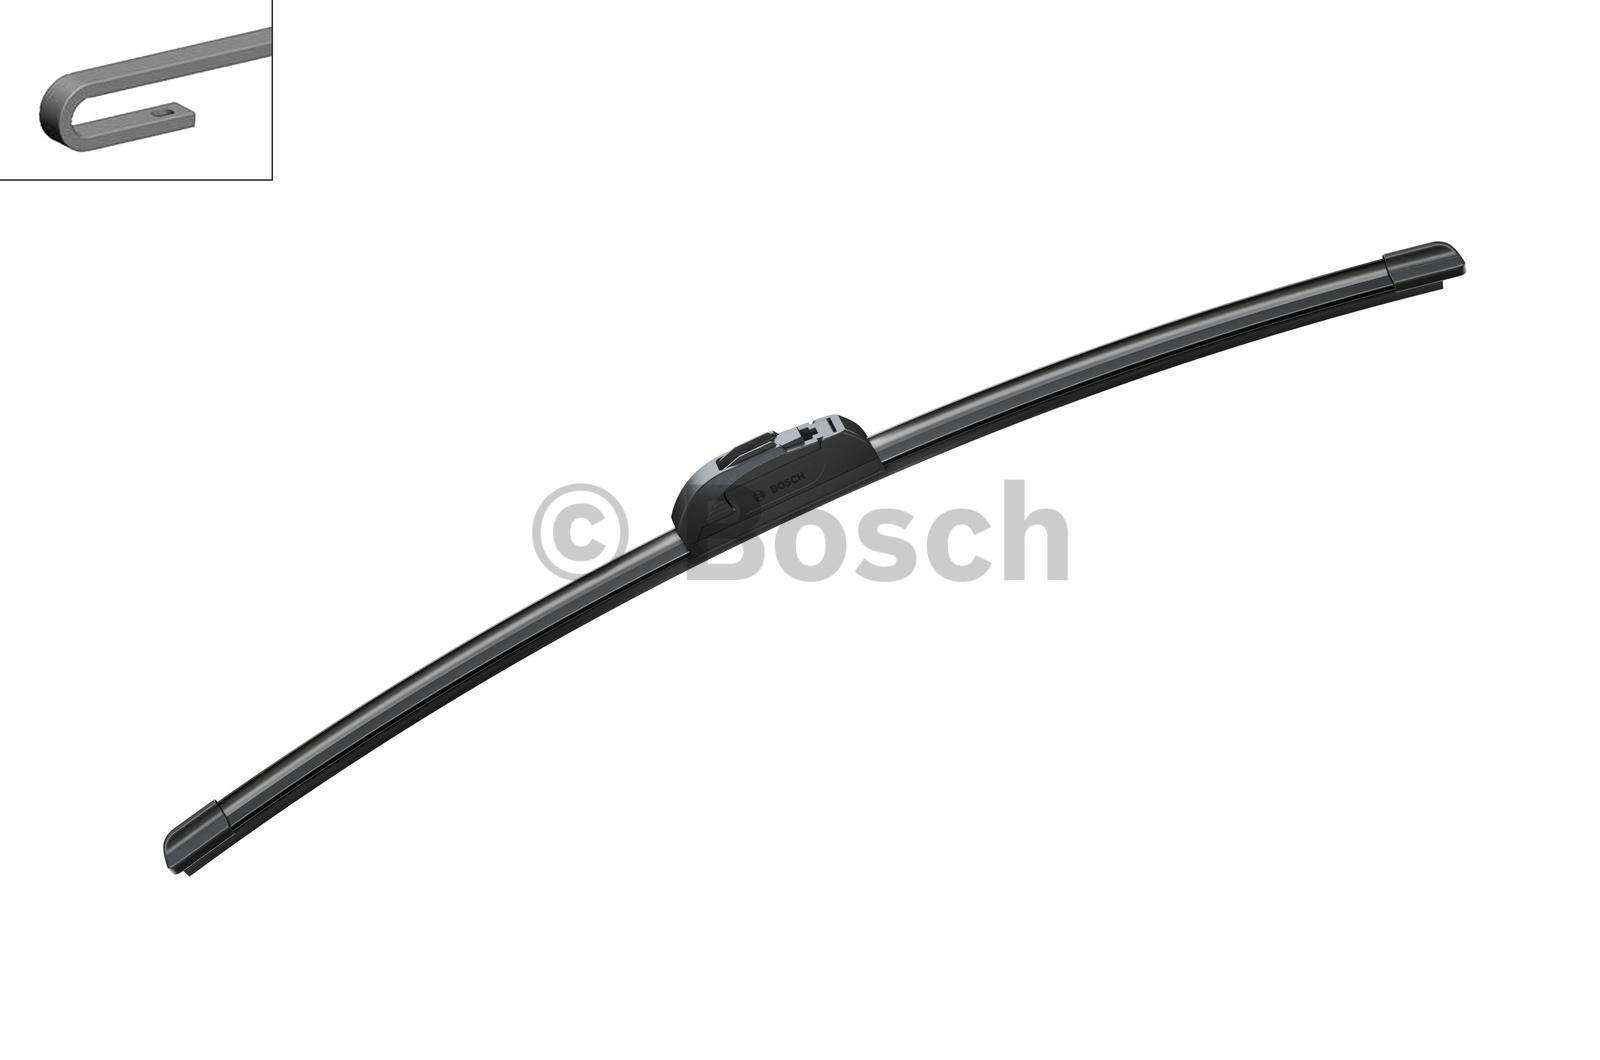 Bosch 3397008537 Щетка бескаркасная, крючок, 550мм